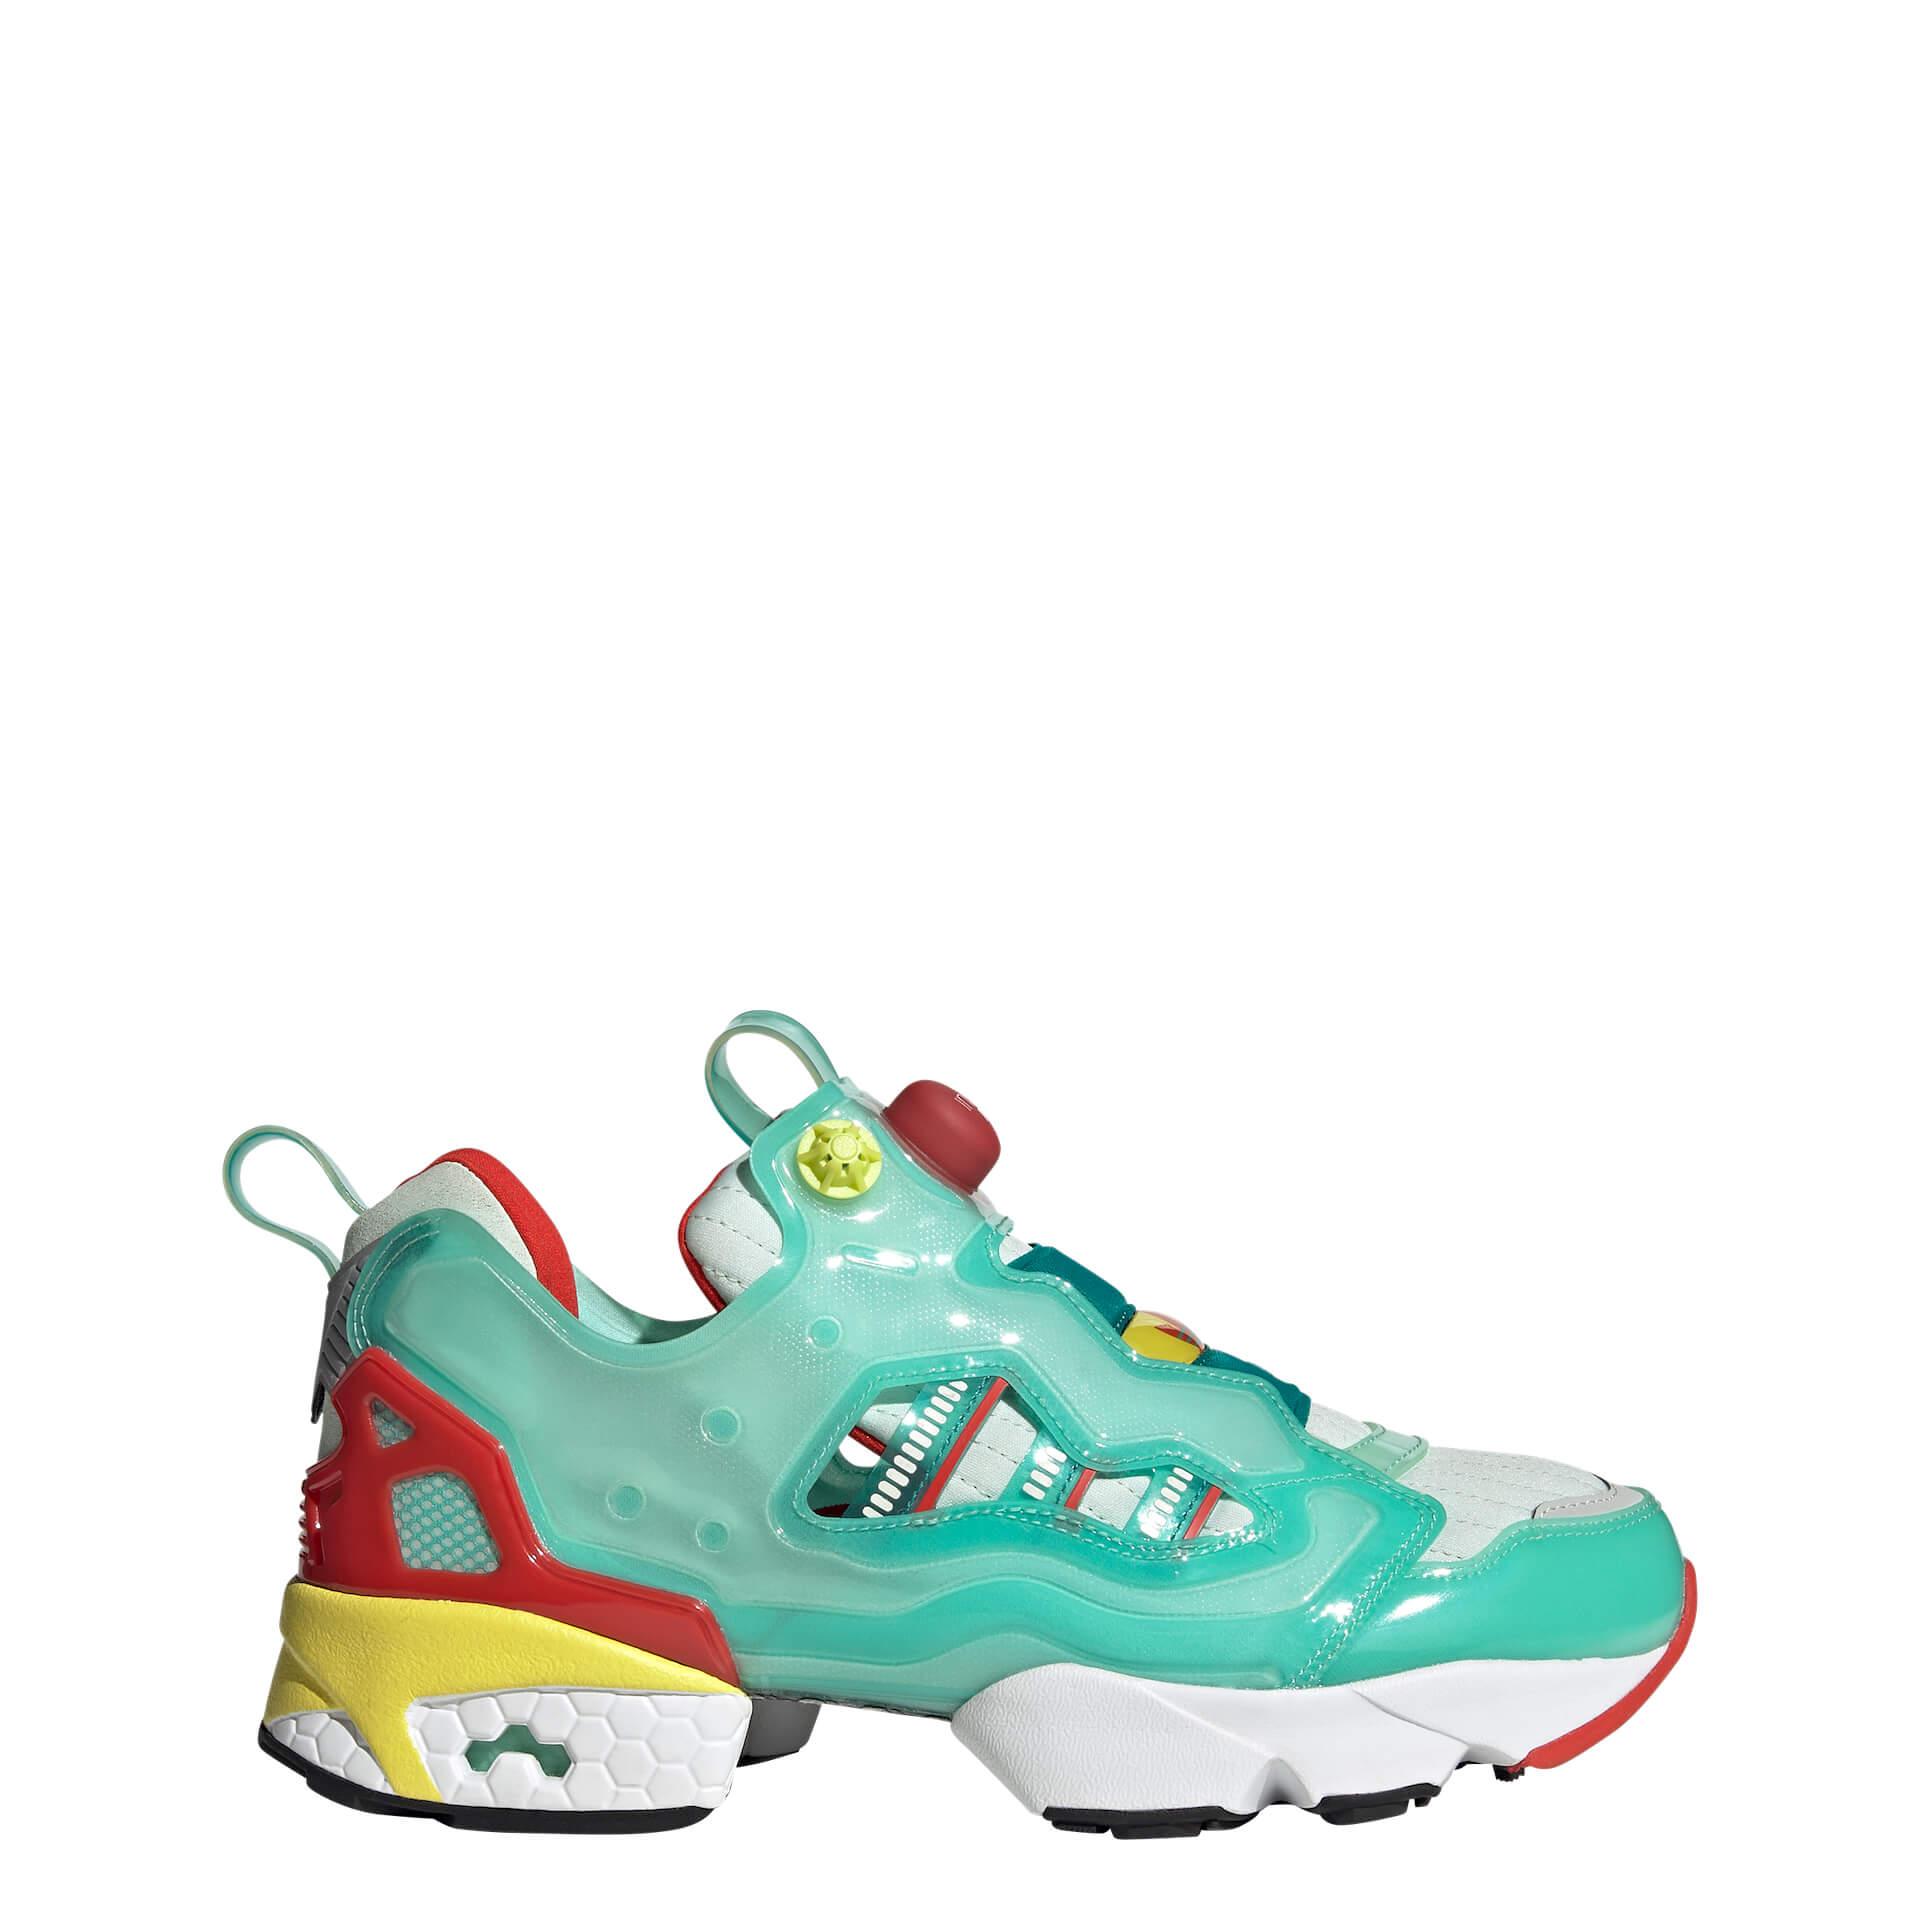 adidas OriginalsとReebokのコラボモデル「ZX FURY」に夏にぴったりの新色4色が登場! life210719_adidasoriginals_reebok_14